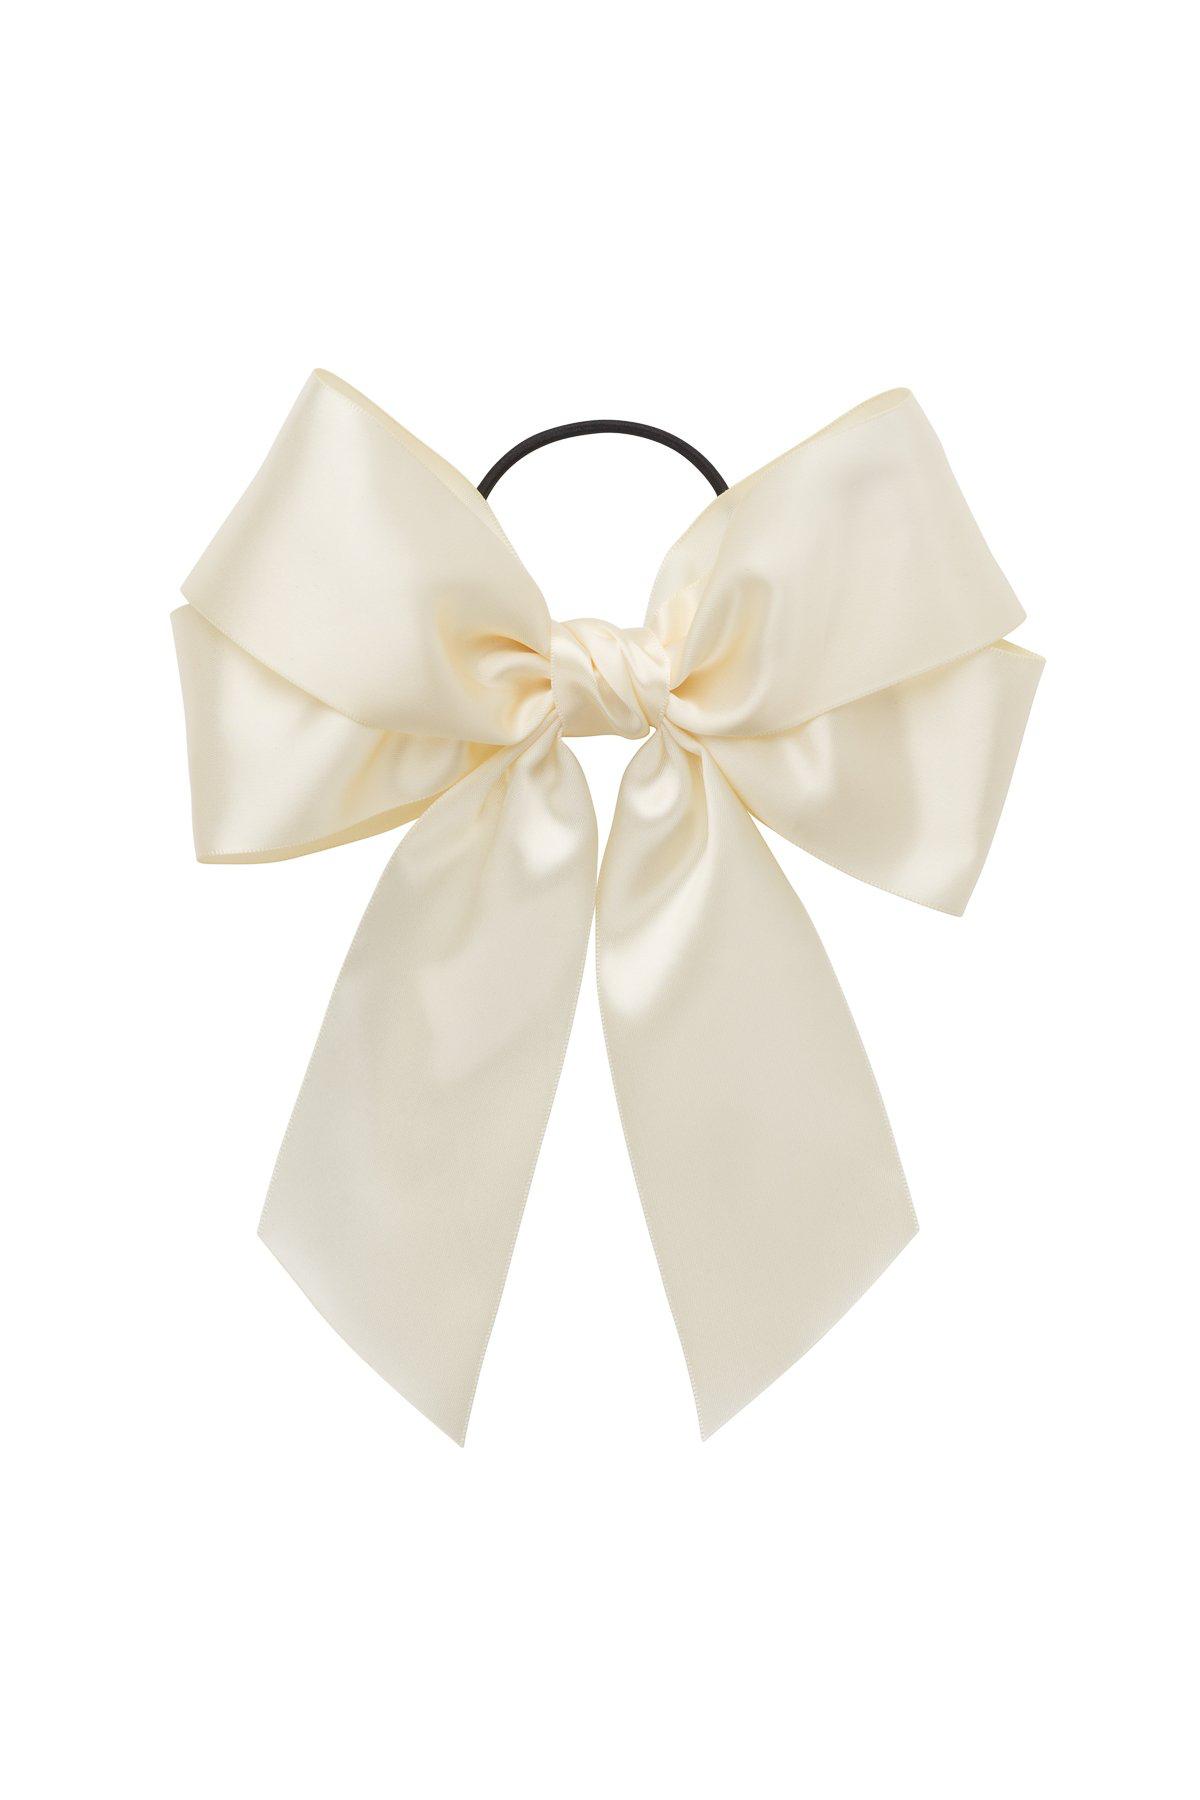 Ivory Satin Lace Bow Hair Clip